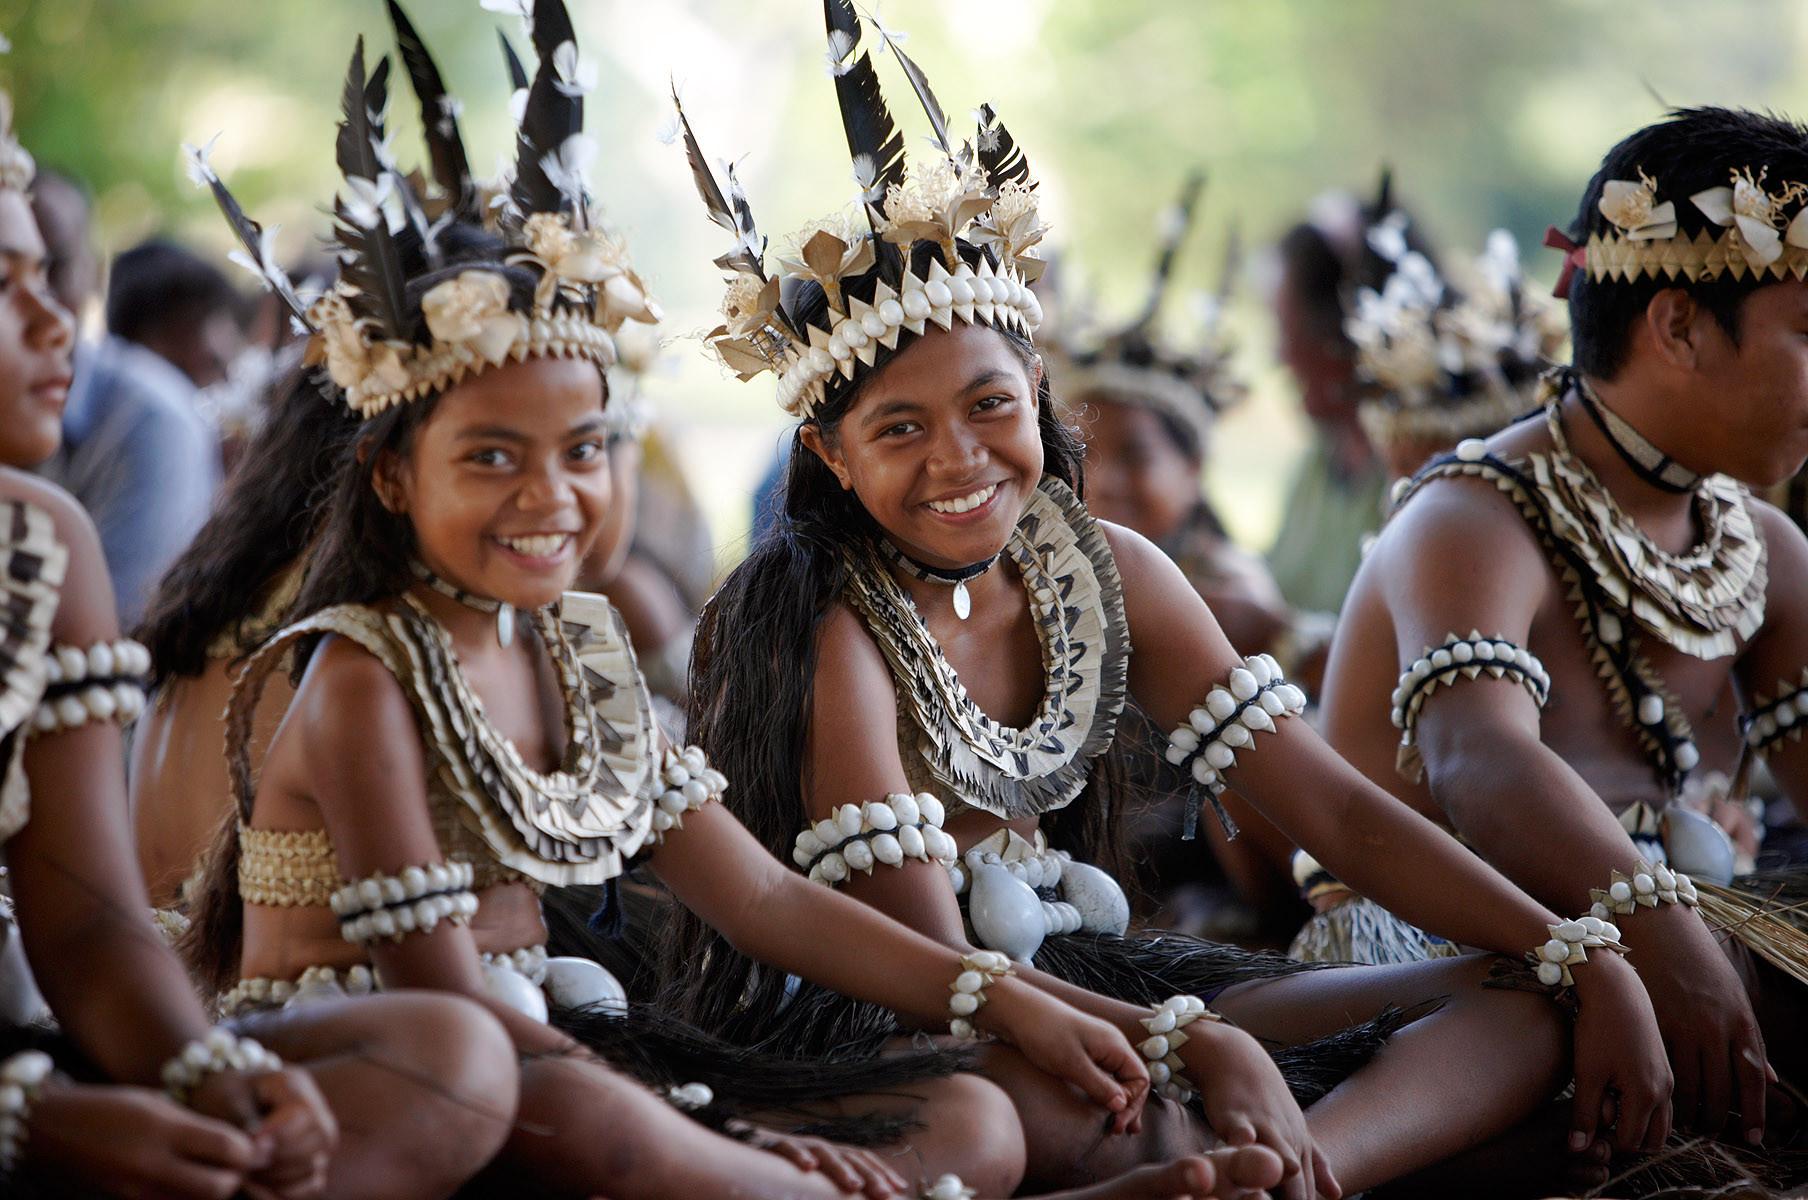 Fiji dating customs